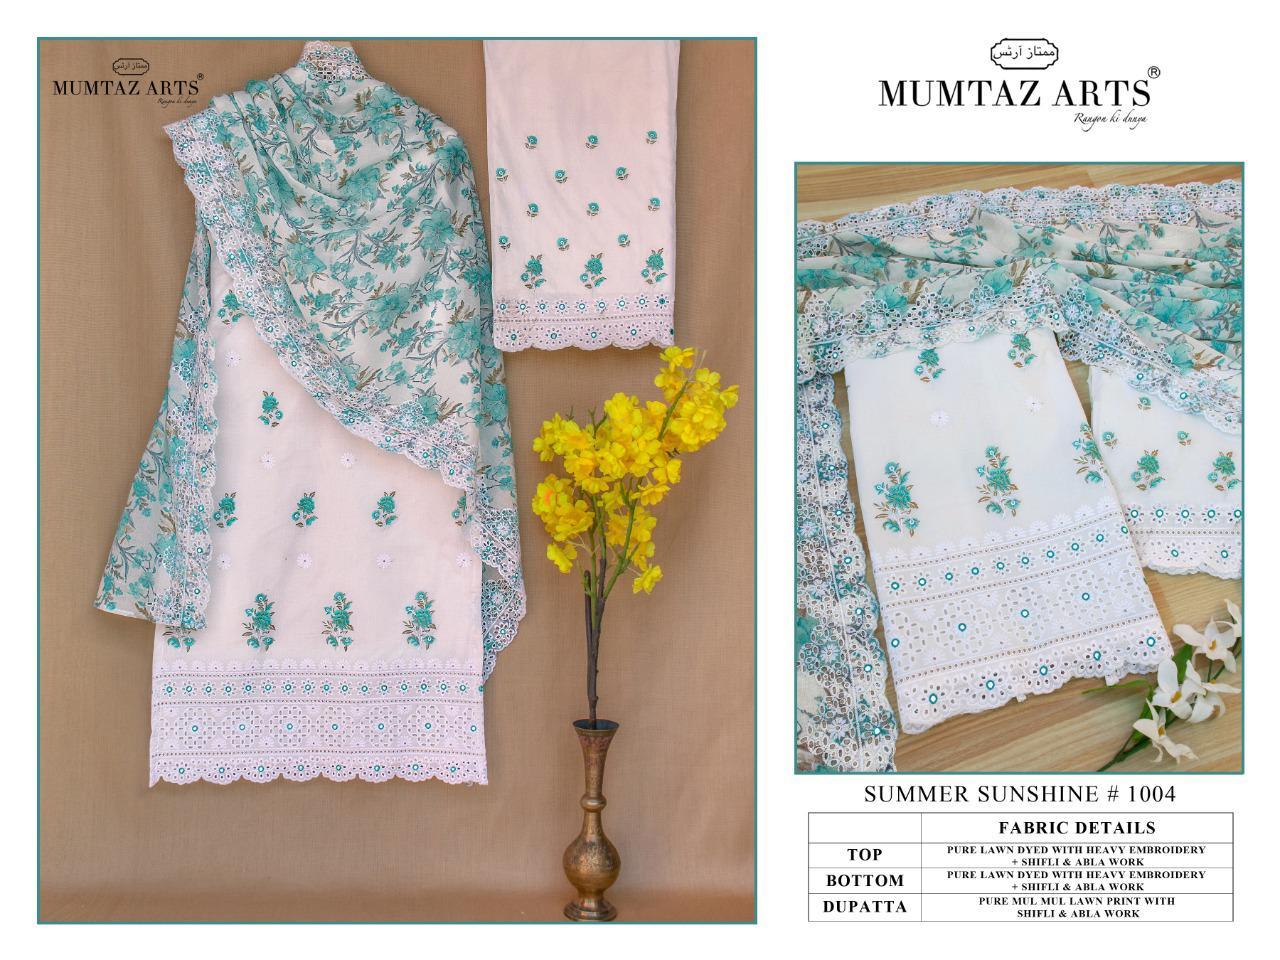 Mumtaz Arts Summer Sunshine 2021 Vol 1 Salwar Suit Wholesale Catalog 4 Pcs 17 - Mumtaz Arts Summer Sunshine 2021 Vol 1 Salwar Suit Wholesale Catalog 4 Pcs